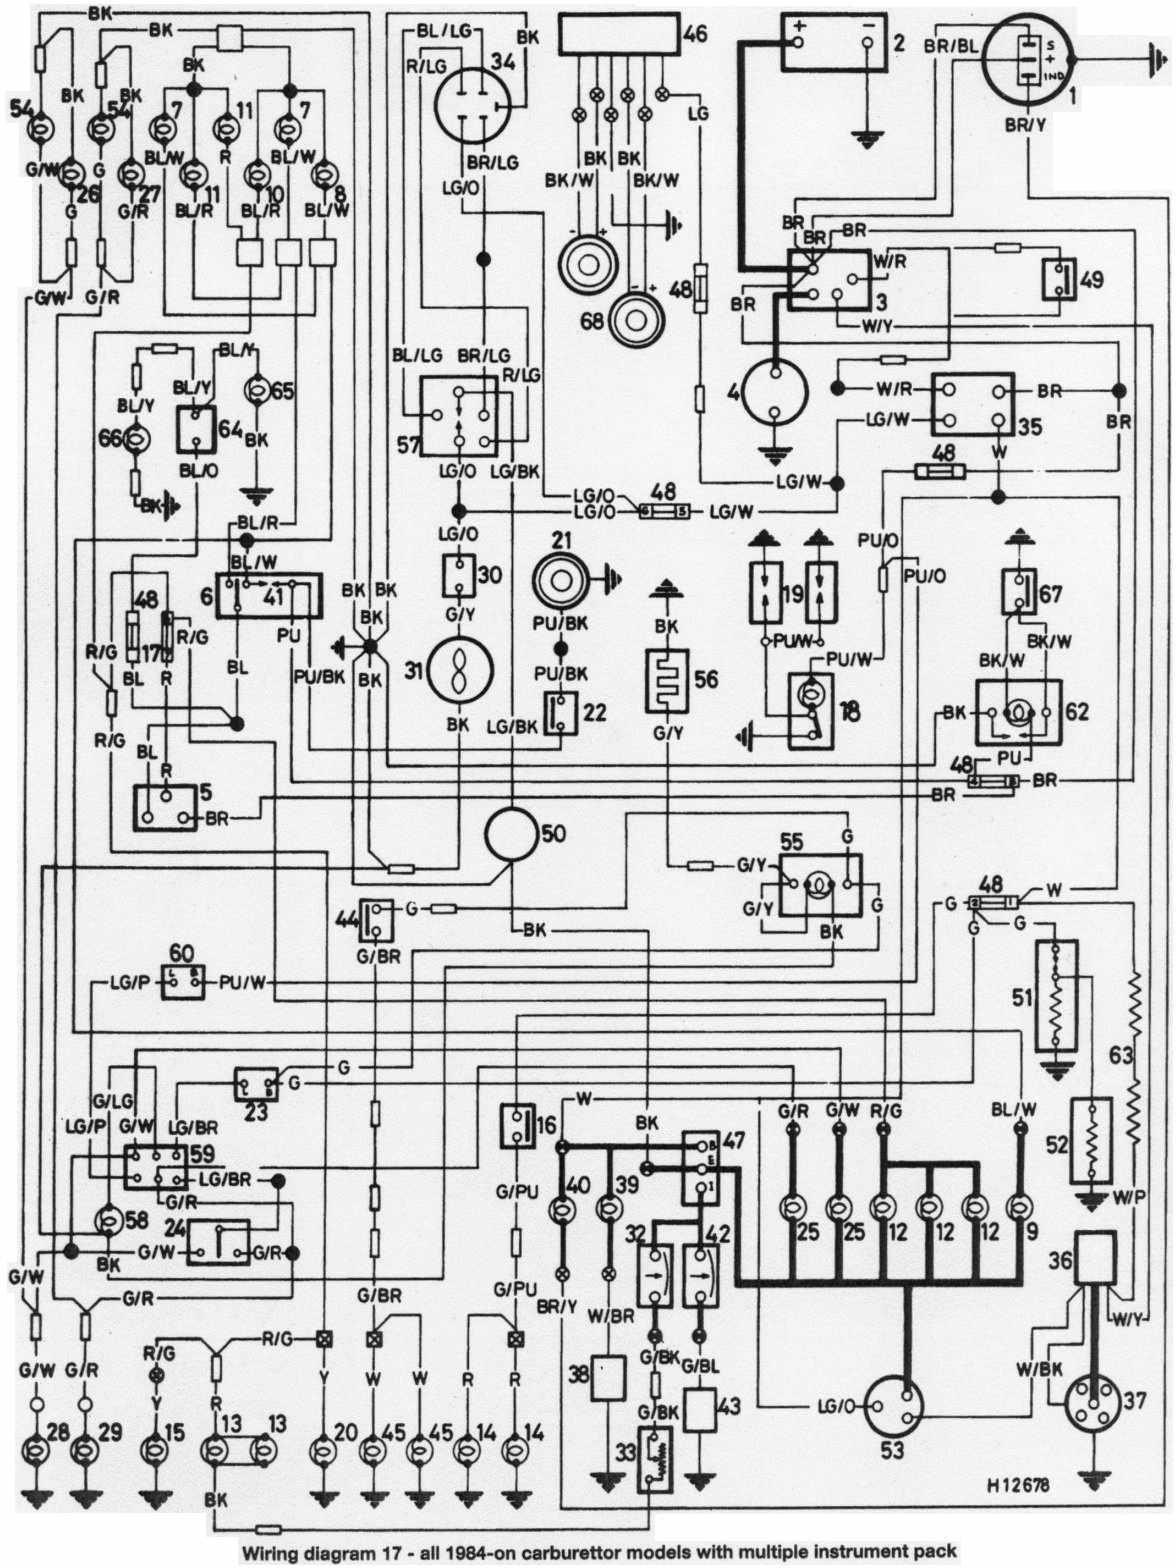 mesmerizing 1985 honda vt750 shadow wiring diagram ideas best electrical wiring marvellous 83 honda shadow vt750 main fuse box wiring images